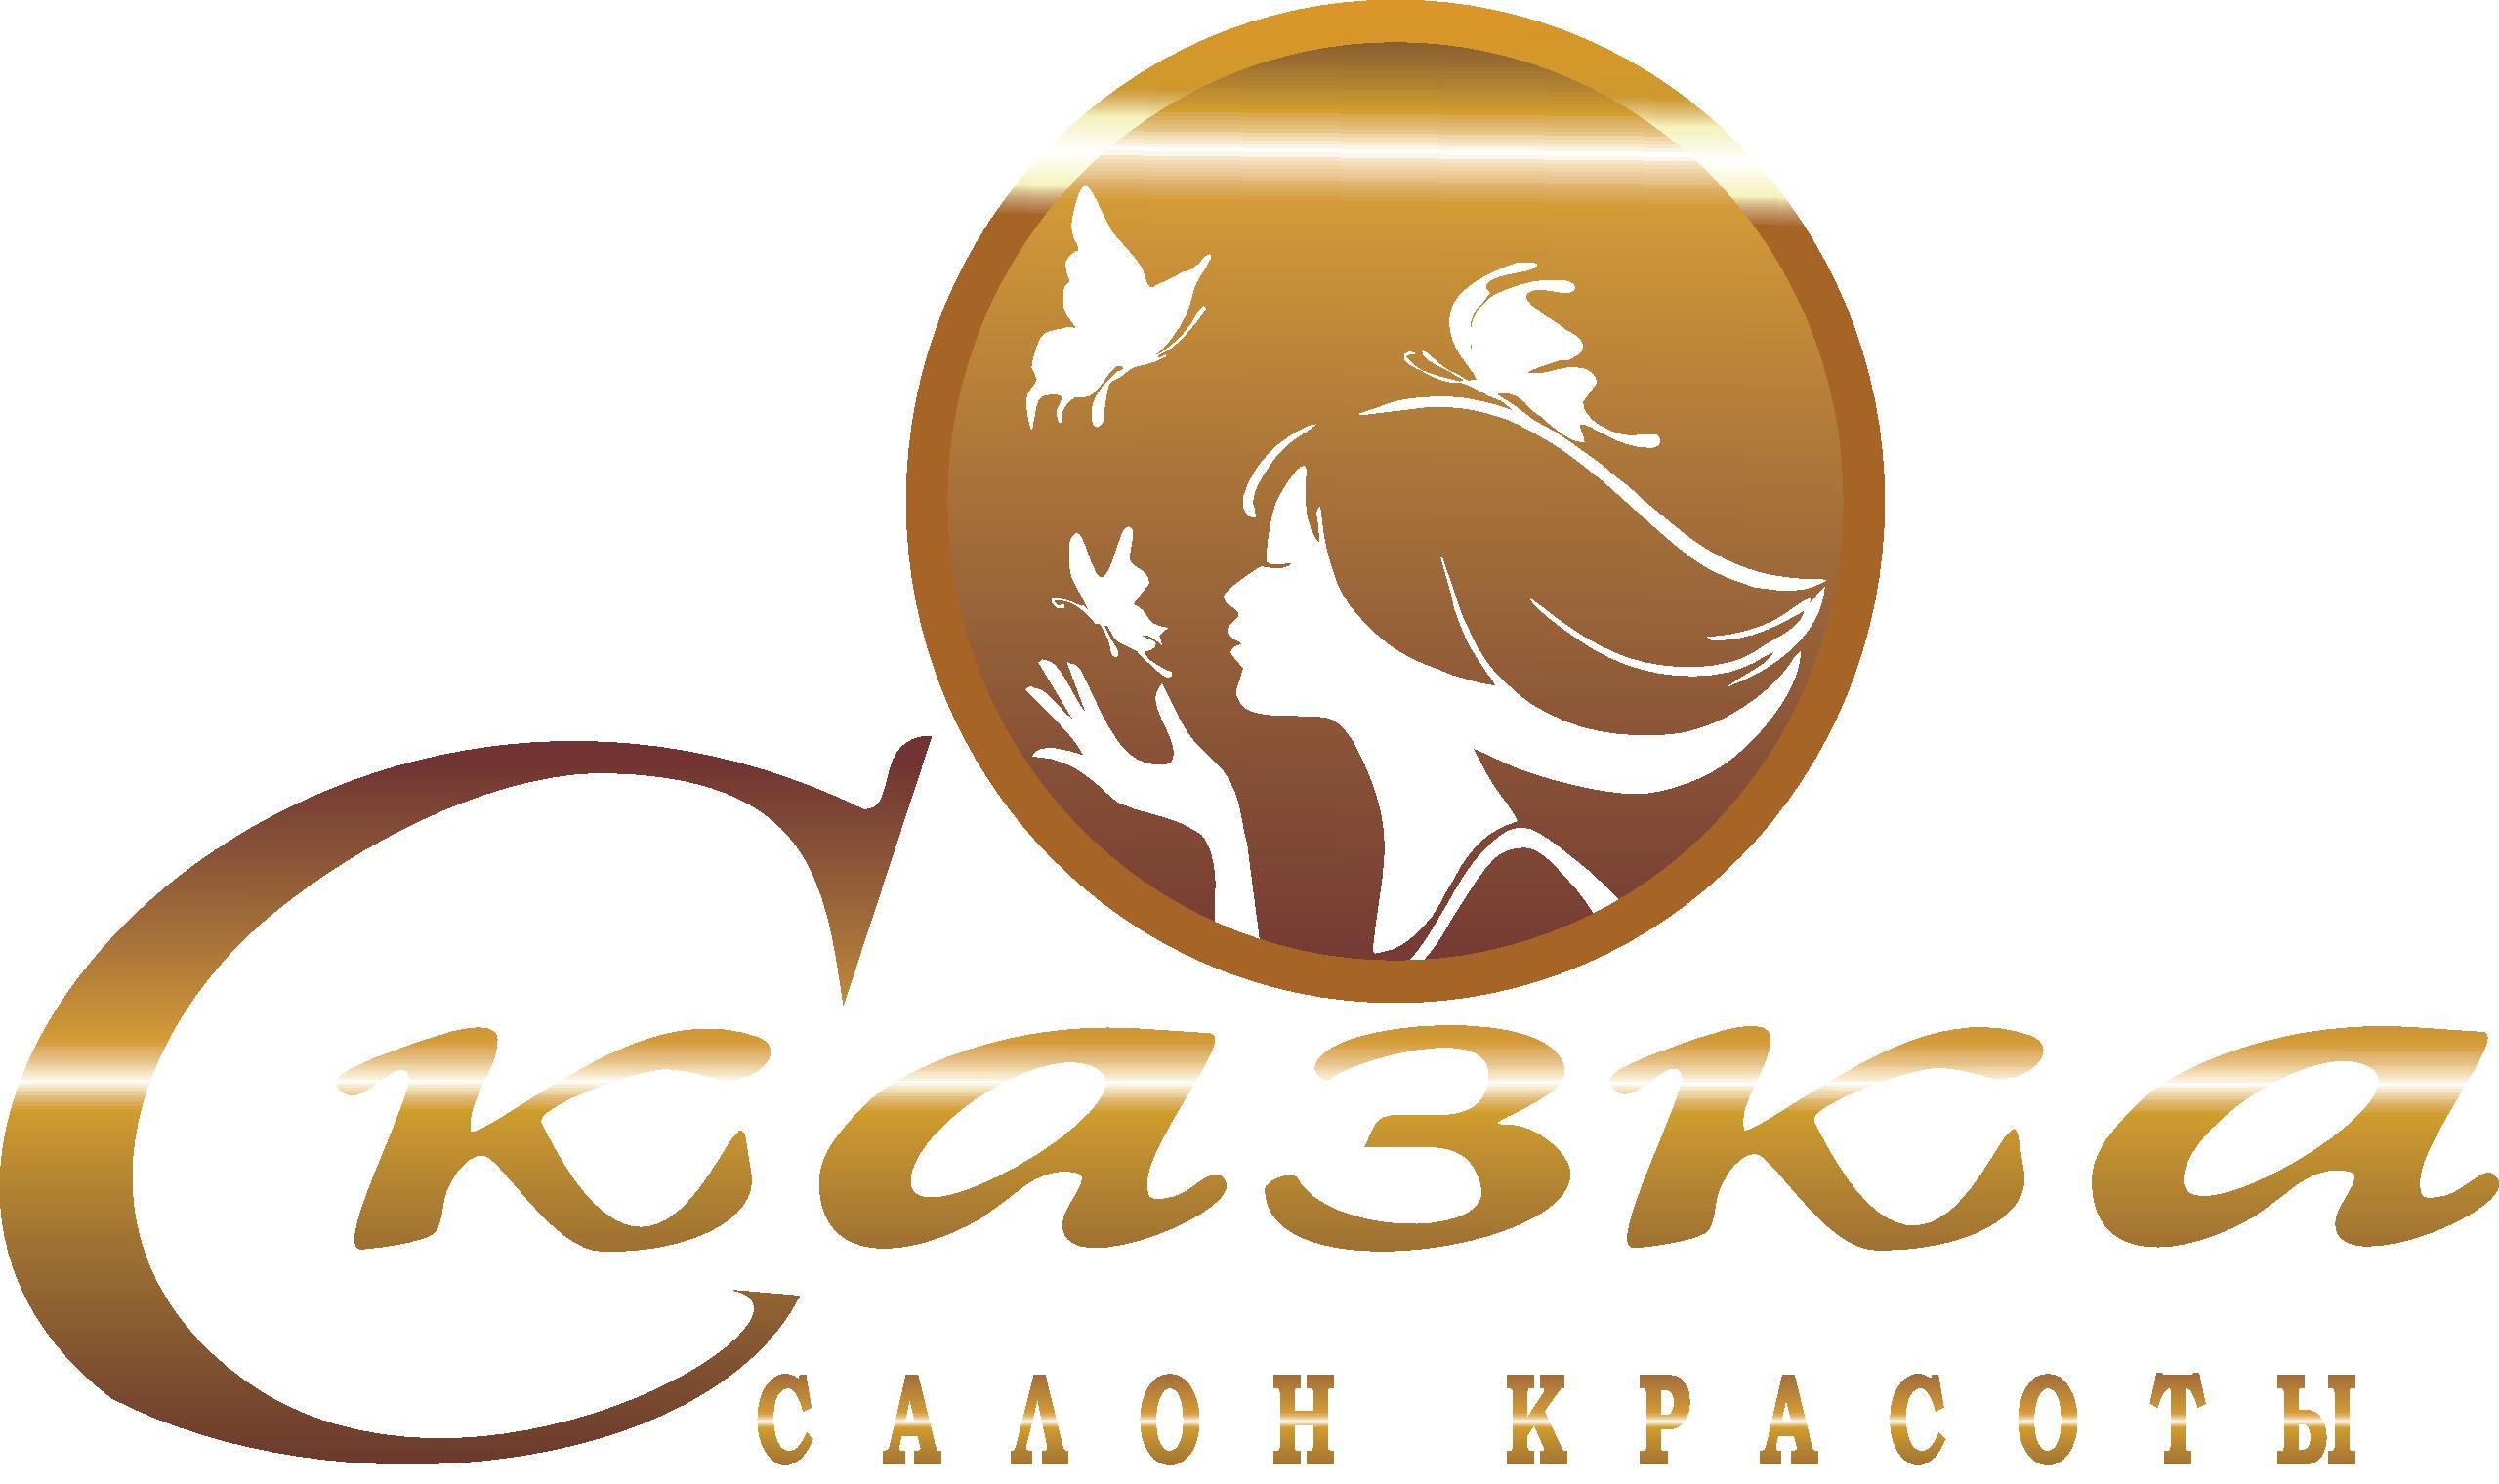 Логотип для салона красоты фото f_996535a16b846a0d.png